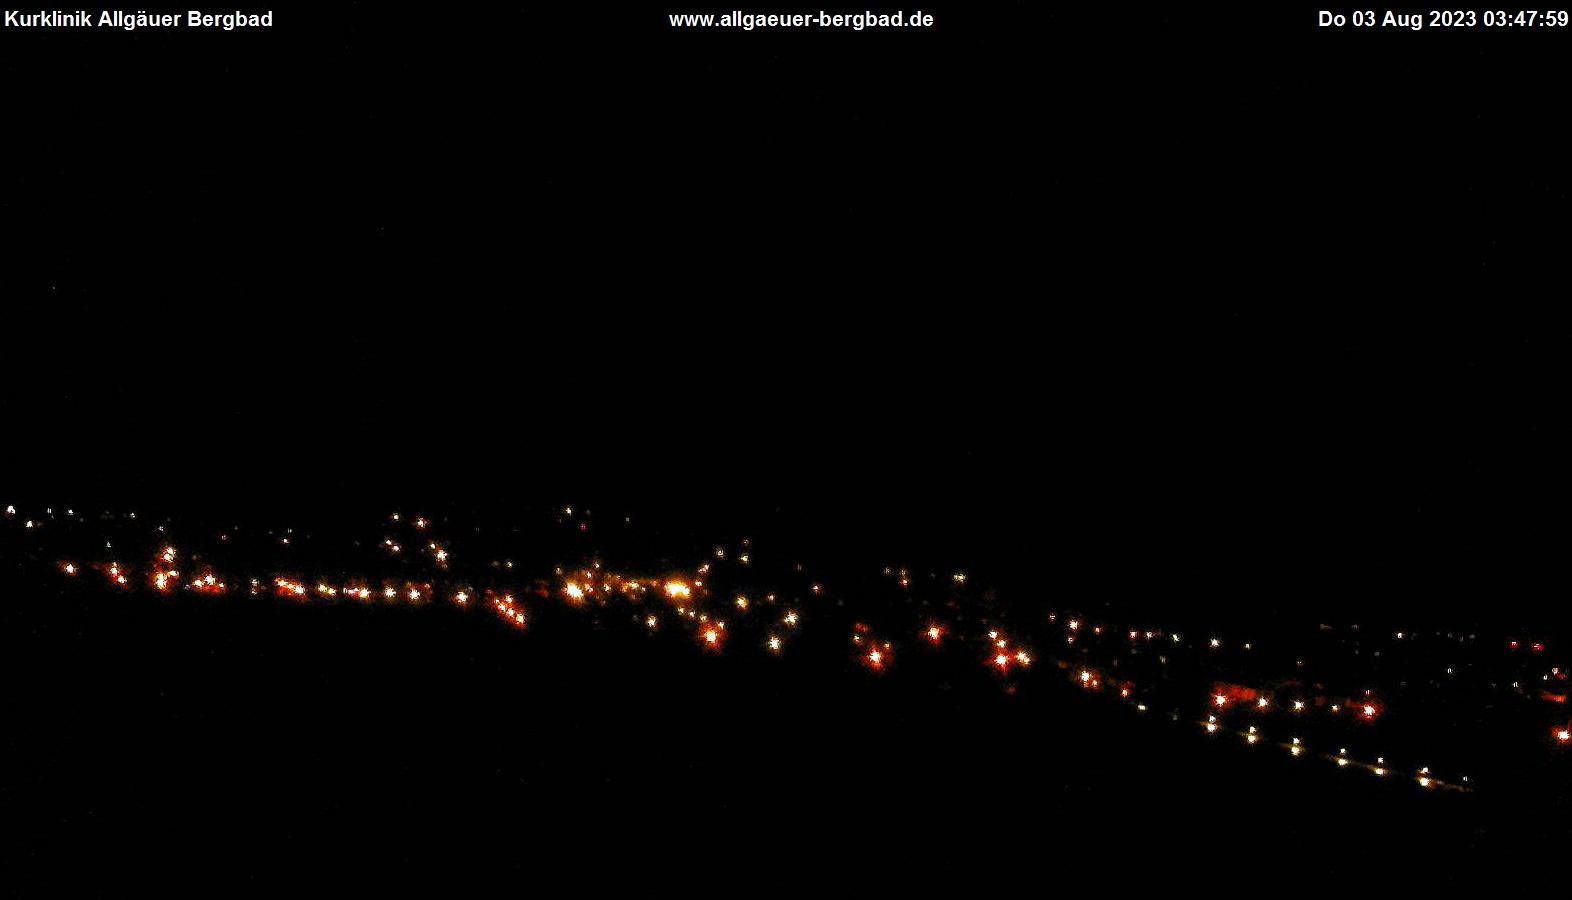 Webcam: Kurklinik Allgäuer Bergbad